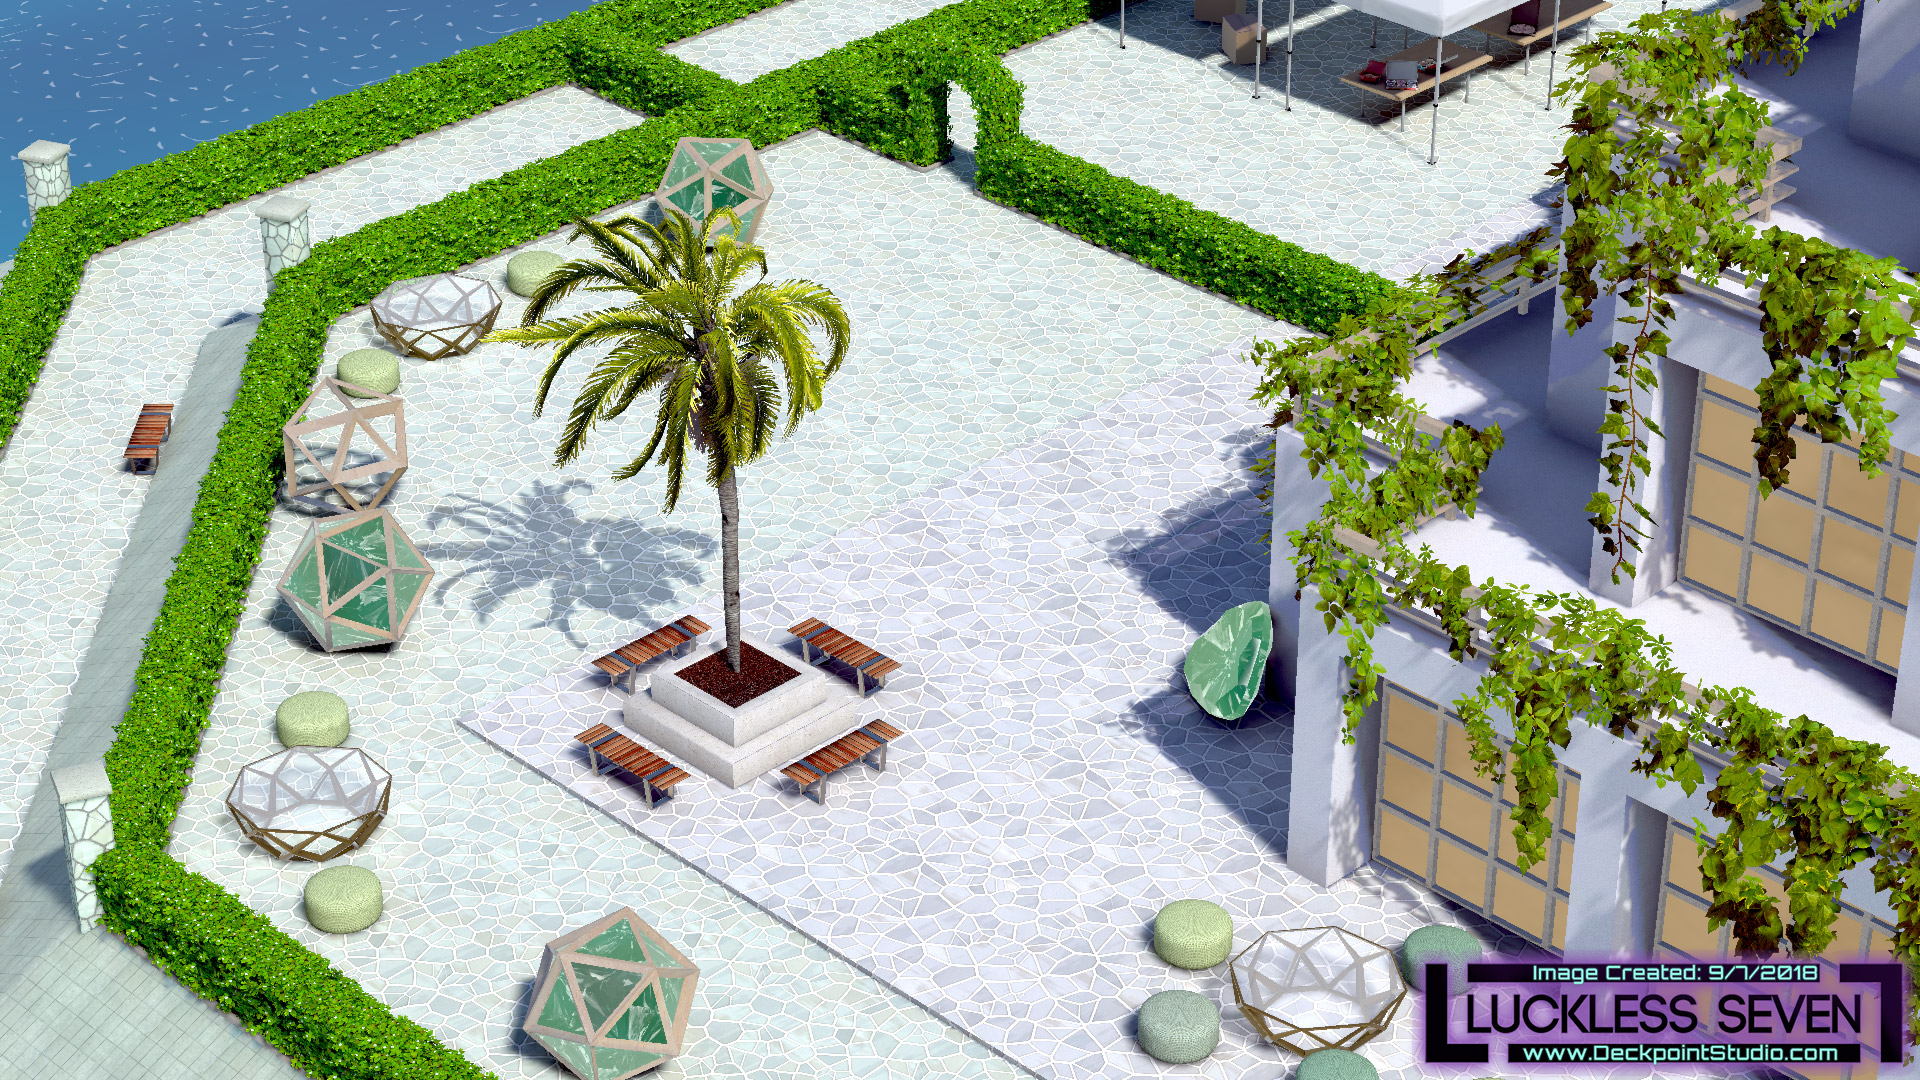 Emerald Casino Luckless Seven 6